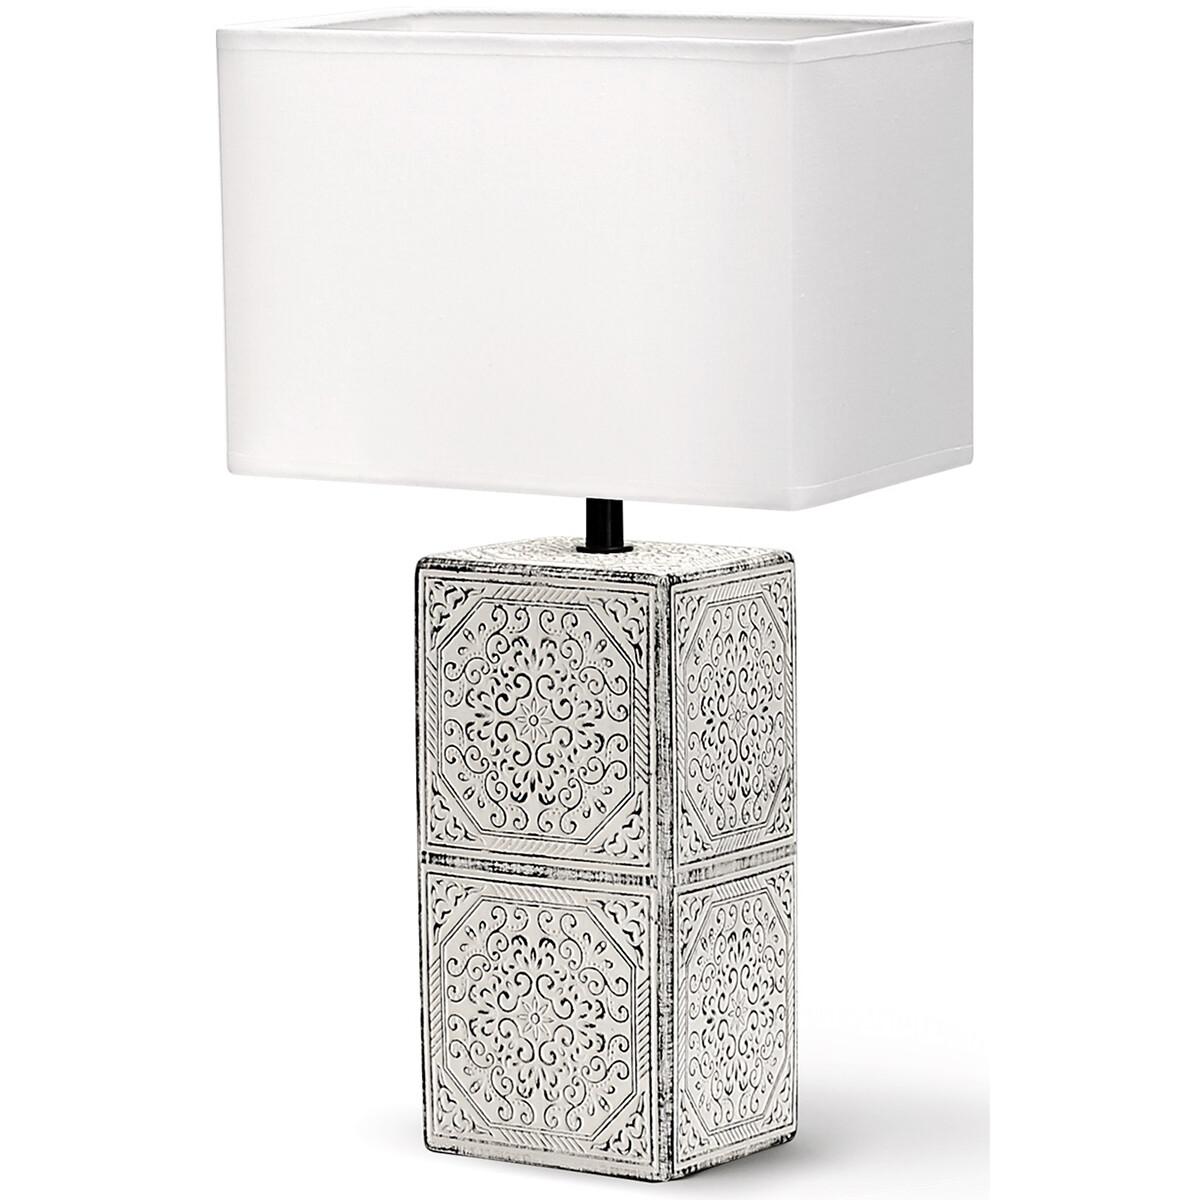 LED Tafellamp - Tafelverlichting - Aigi Astron XL - E14 Fitting - Vierkant - Mat Zwart/Wit - Keramie